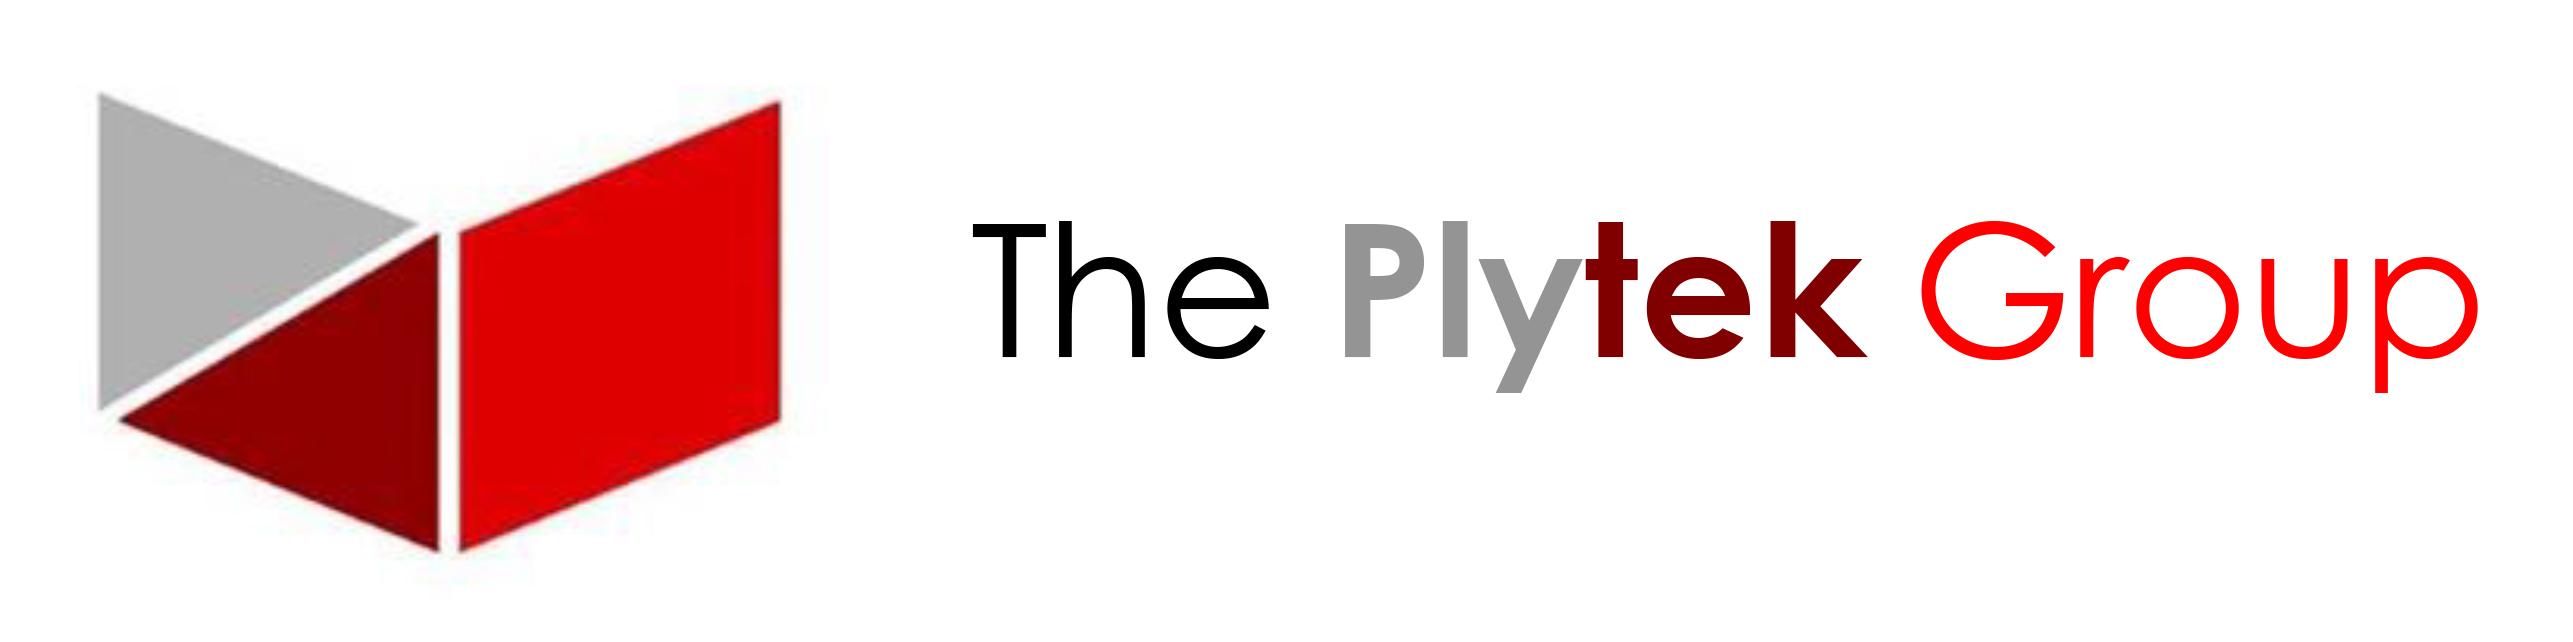 The Plytek Group